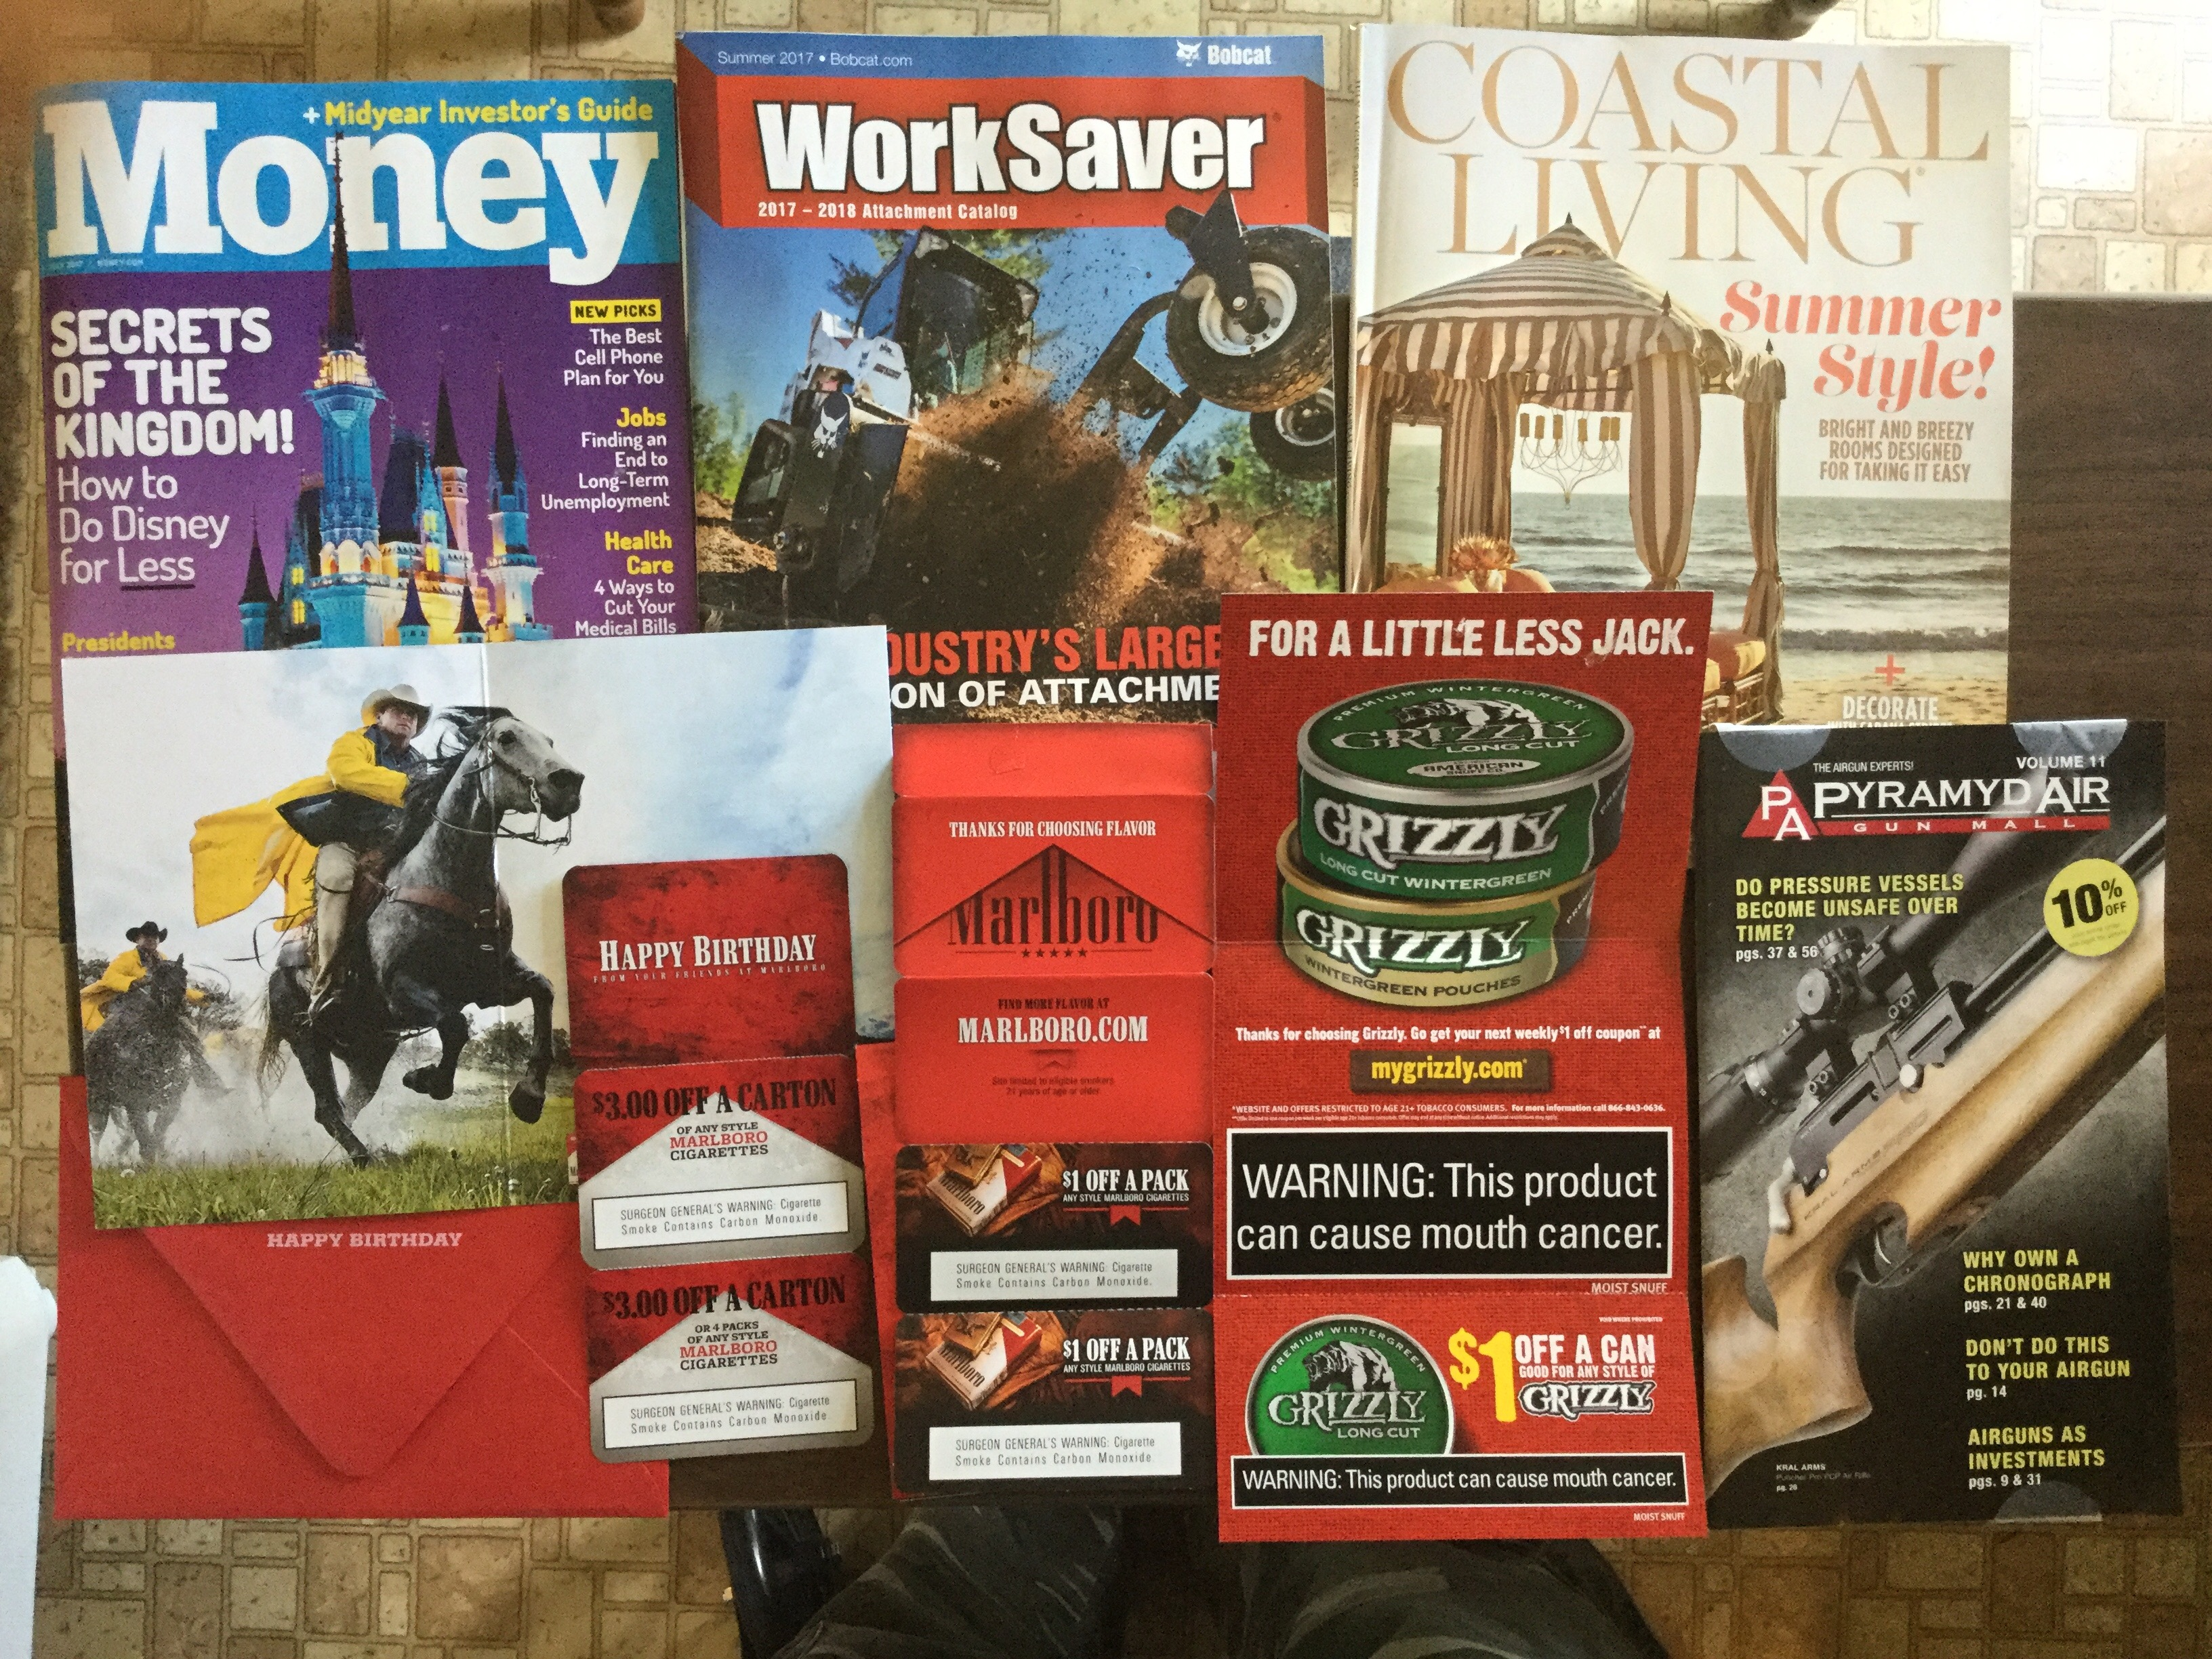 6-14-2017 Free Mail 💰Money 🚜 WorkSaver 🏖Coastal Living ...